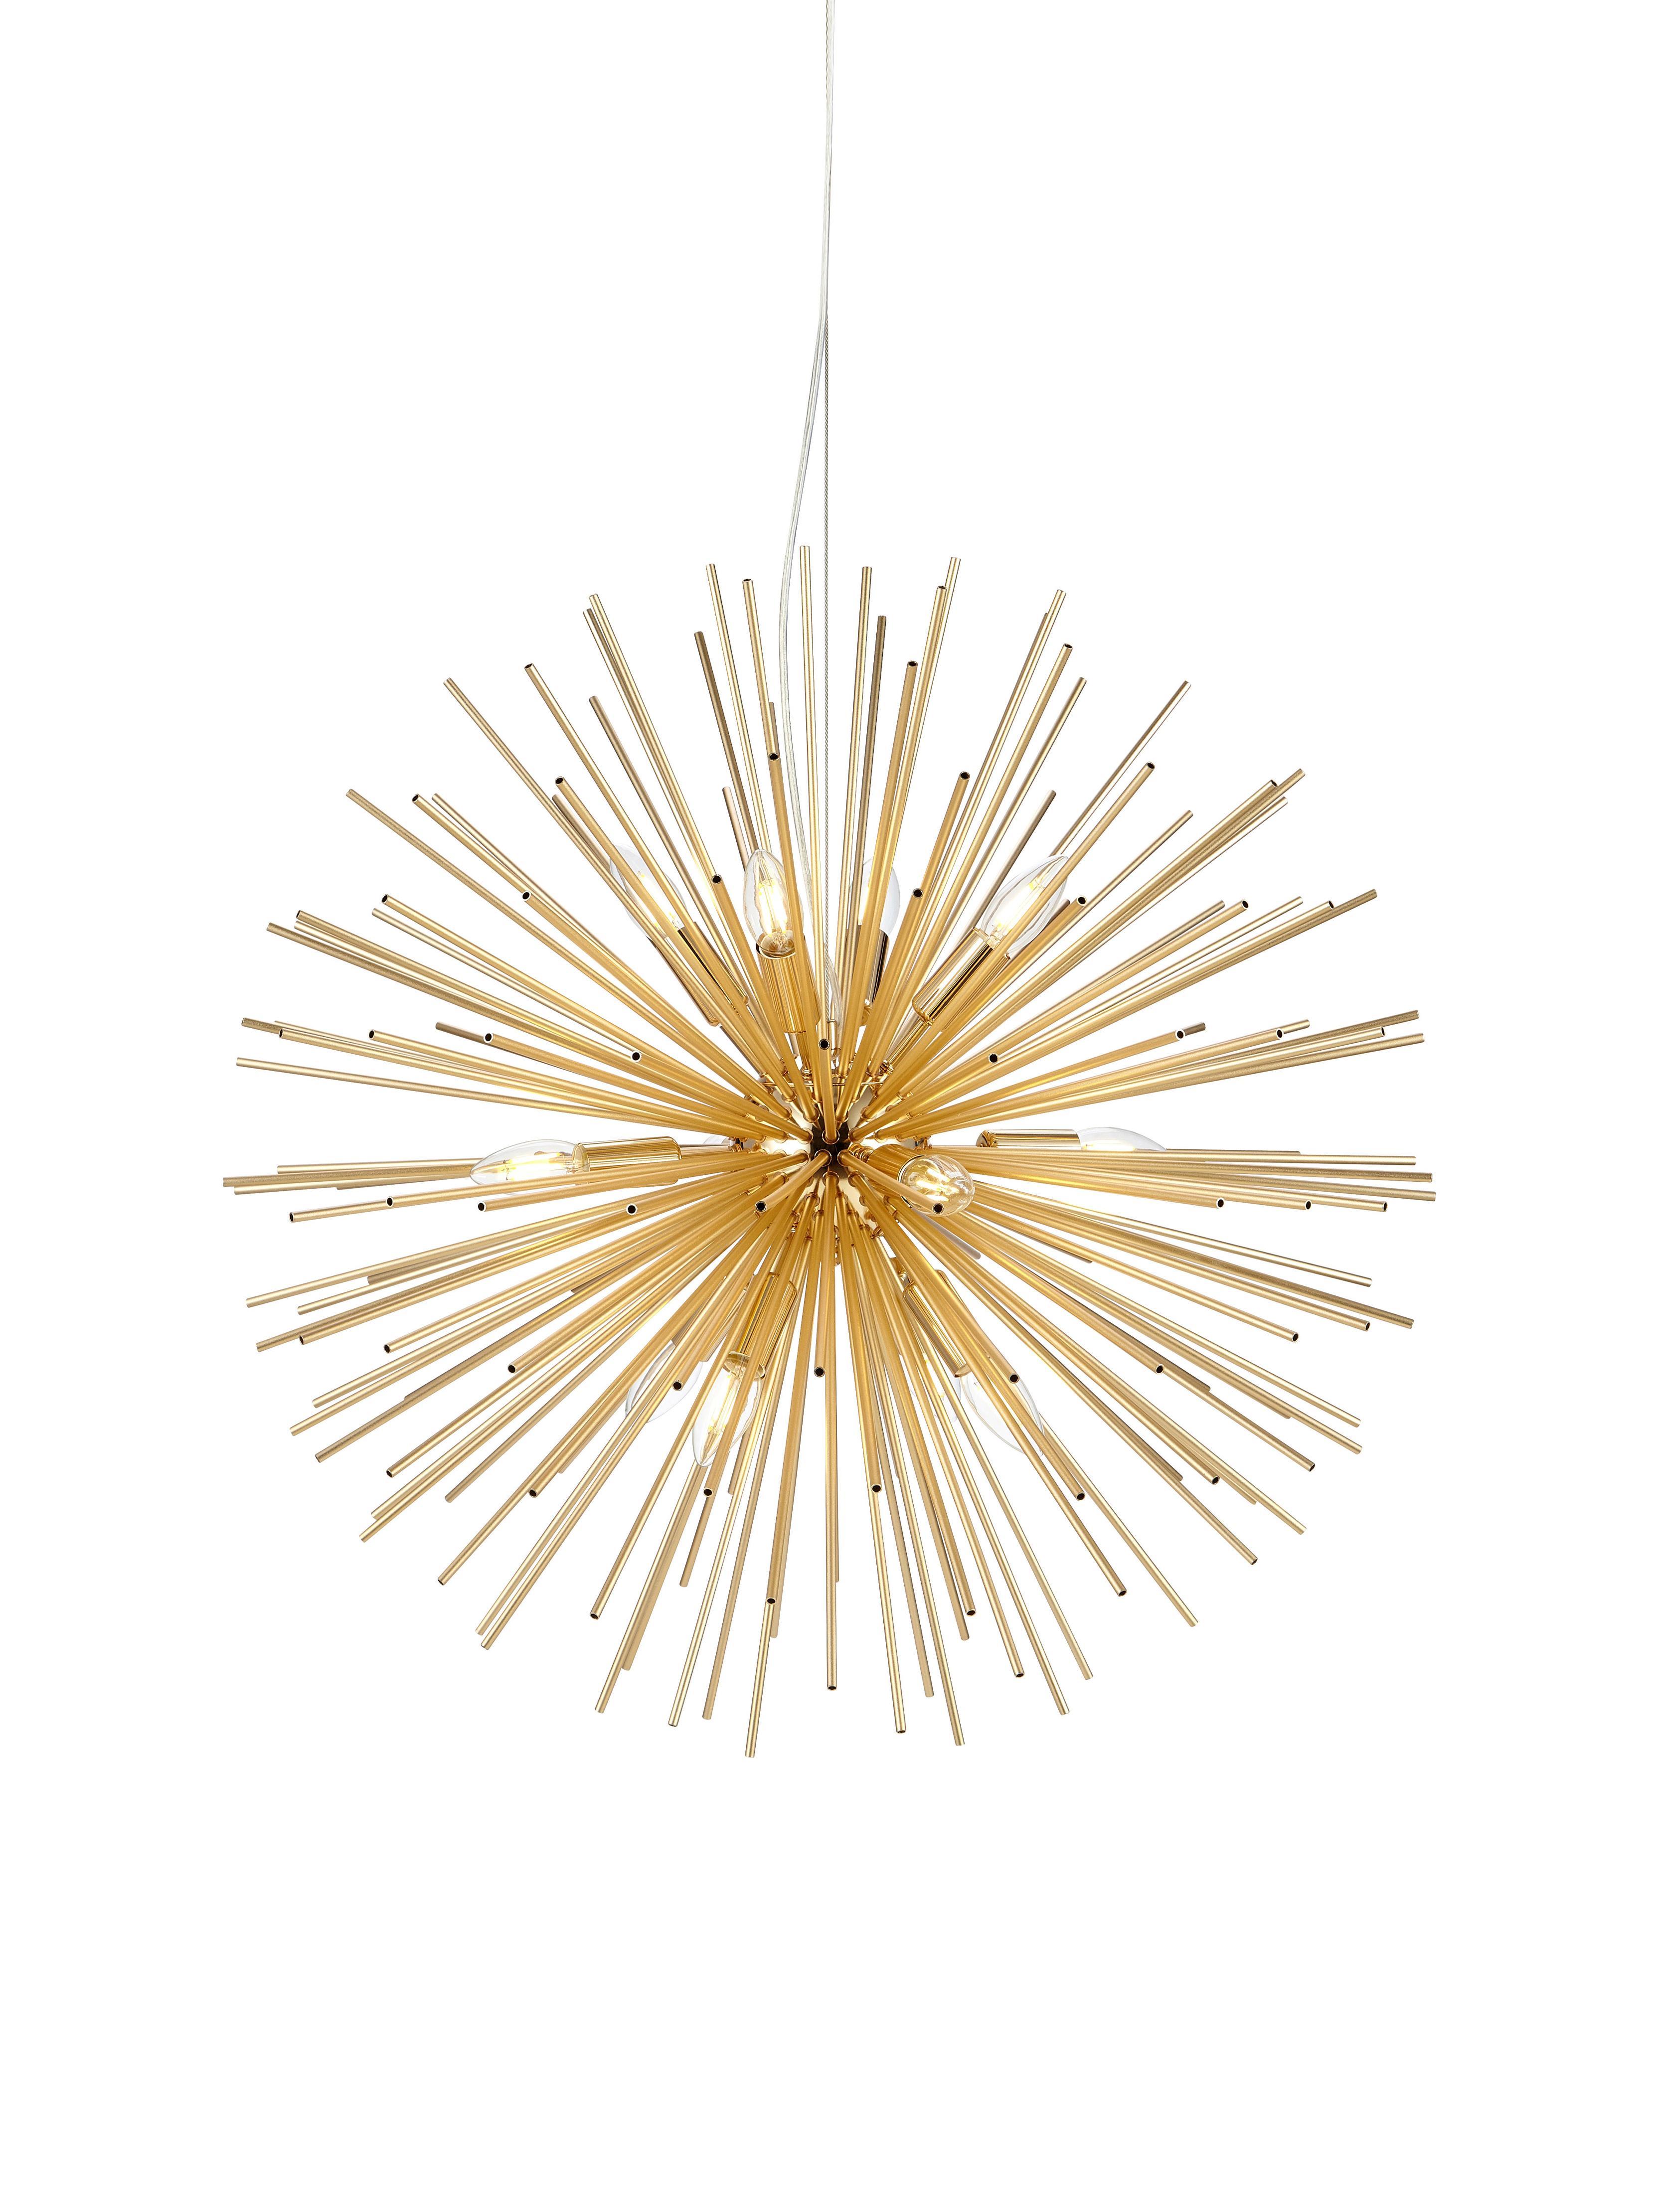 Hanglamp Soleil, Messingkleurig, Ø 72 x H 200 cm